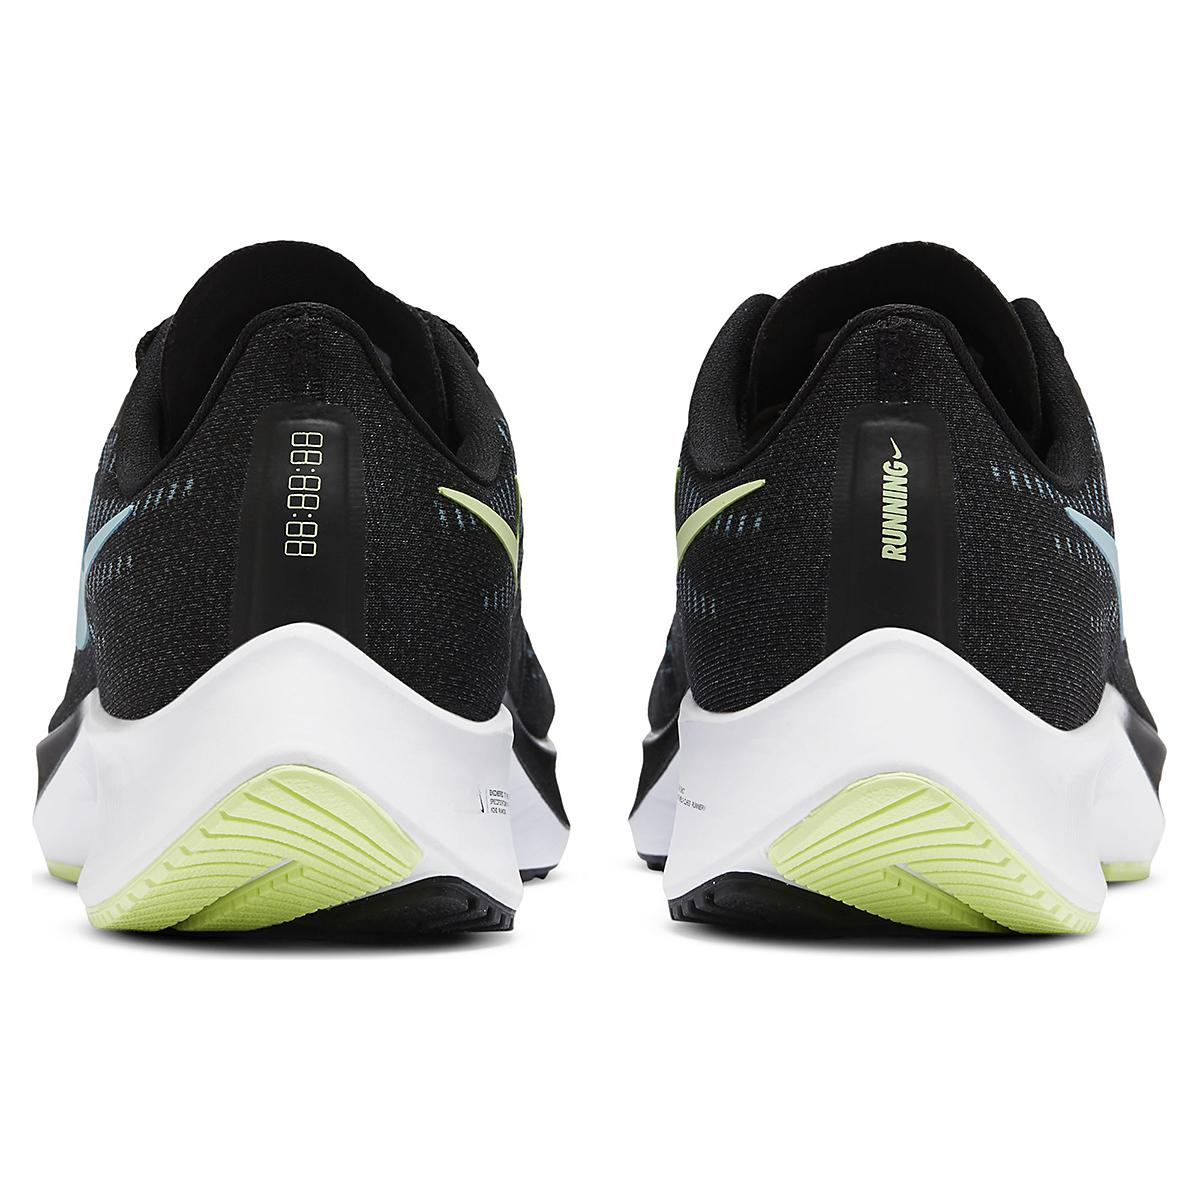 Women's Nike Air Zoom Pegasus 37 Running Shoe - Color: Black/Glacier Ice-Barely Volt-White - Size: 6 - Width: Regular, Black/Glacier Ice-Barely Volt-White, large, image 5